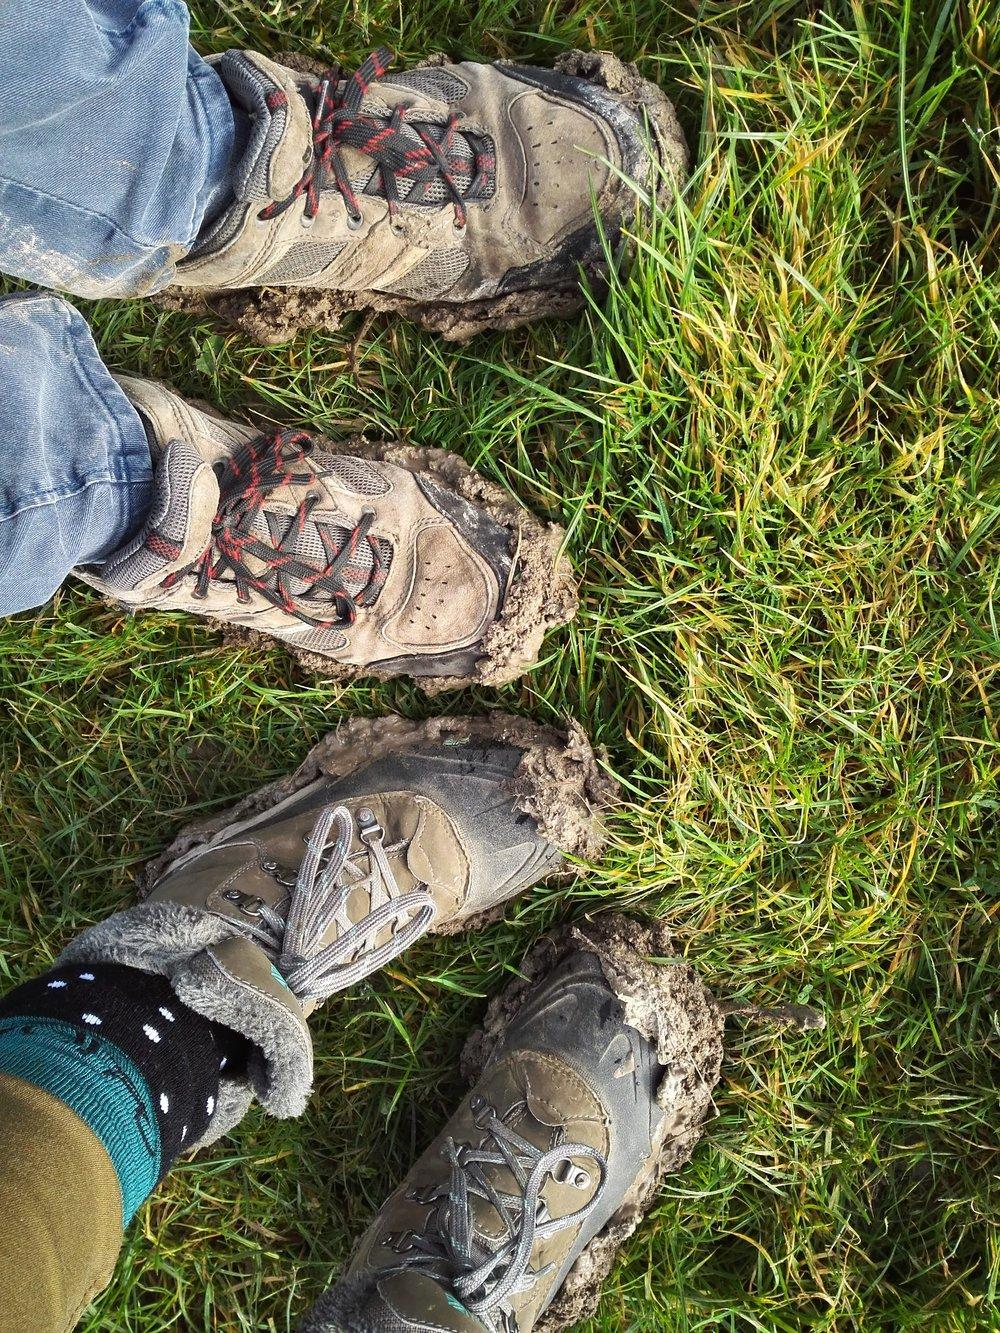 Sludgy mud a lot of the way